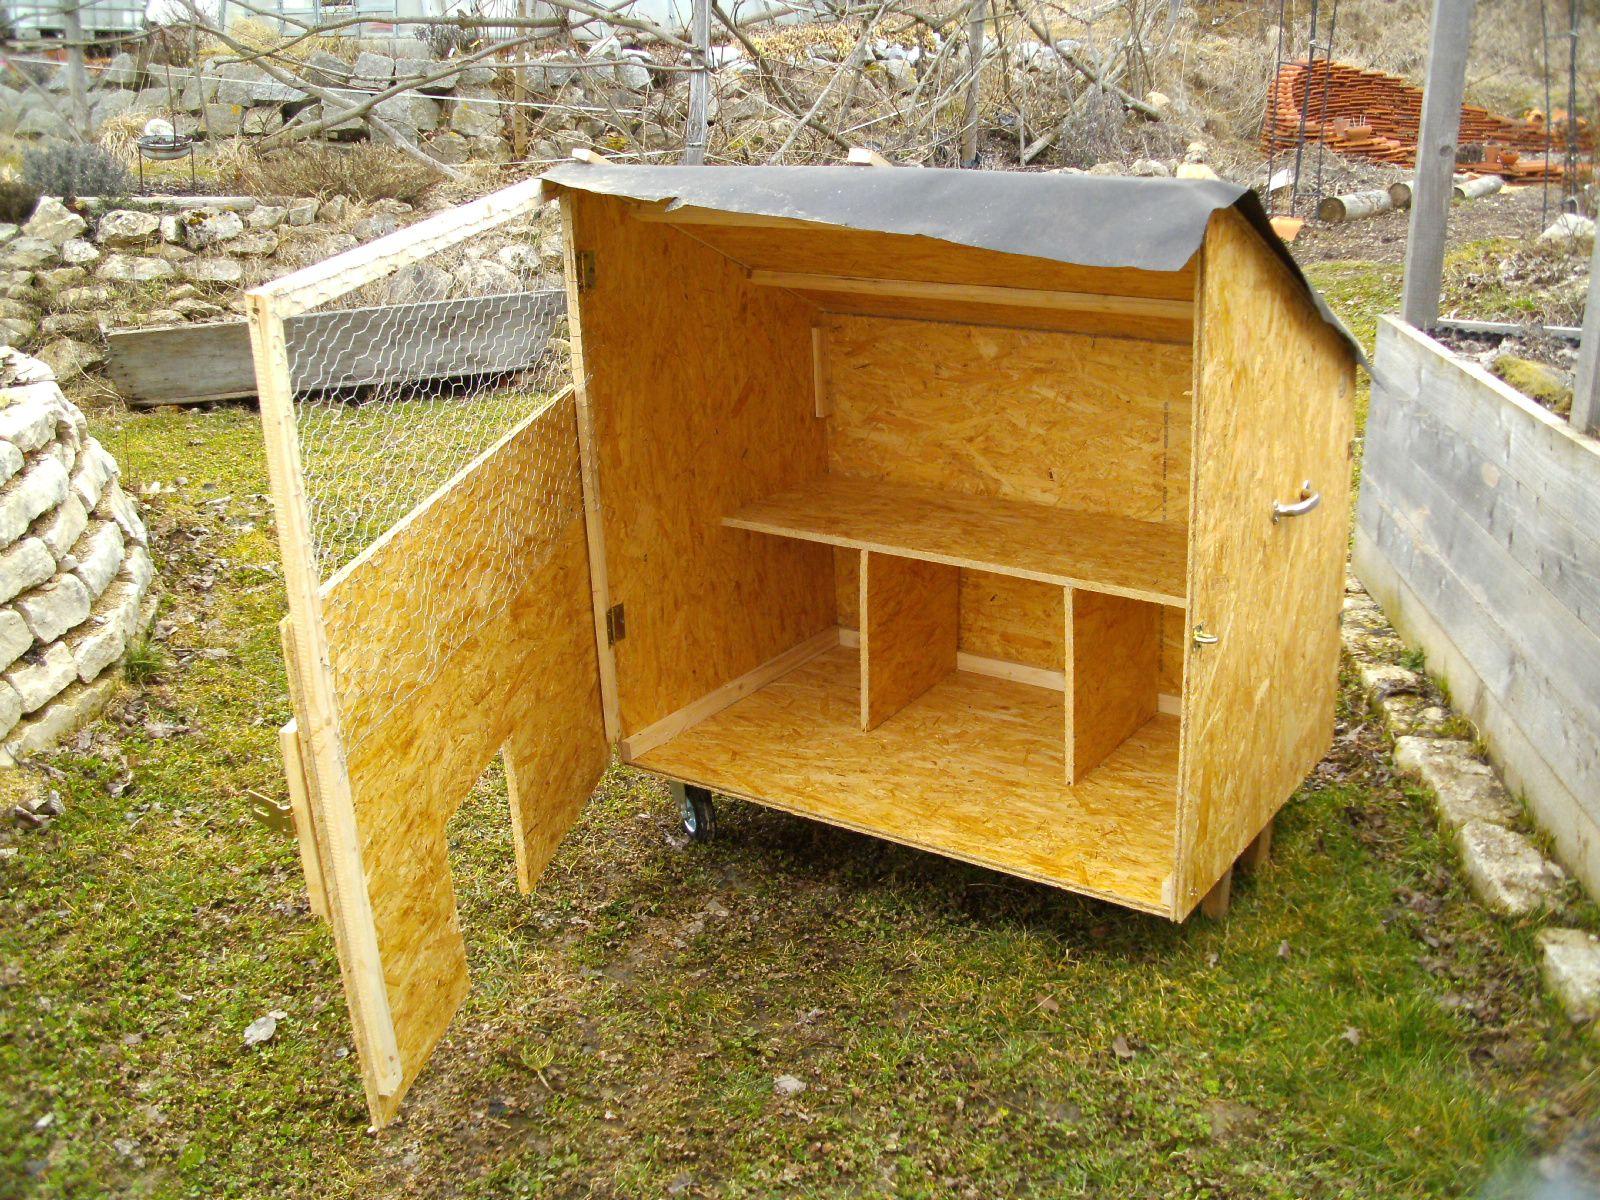 mobiler h hnerstall haus pinterest h hnerstall h hner und mobiler h hnerstall. Black Bedroom Furniture Sets. Home Design Ideas